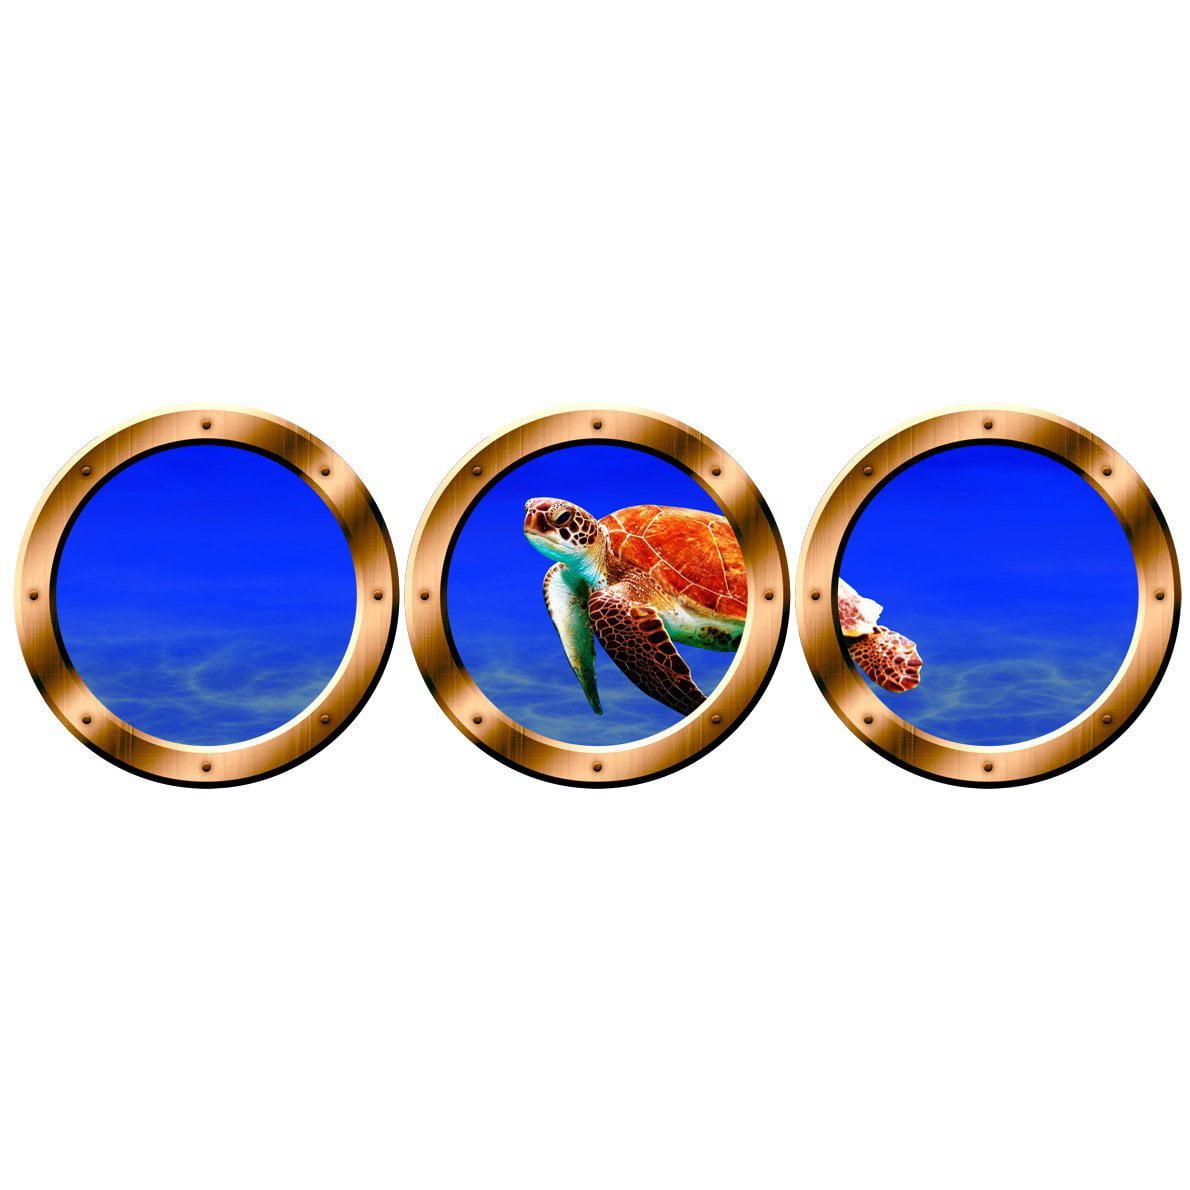 "VWAQ Ocean Porthole - Sea Turtle Animals Wall Stickers, Submarine Window Decal -VWAQ-SPW20 (24"" Diameter, Bronze)"